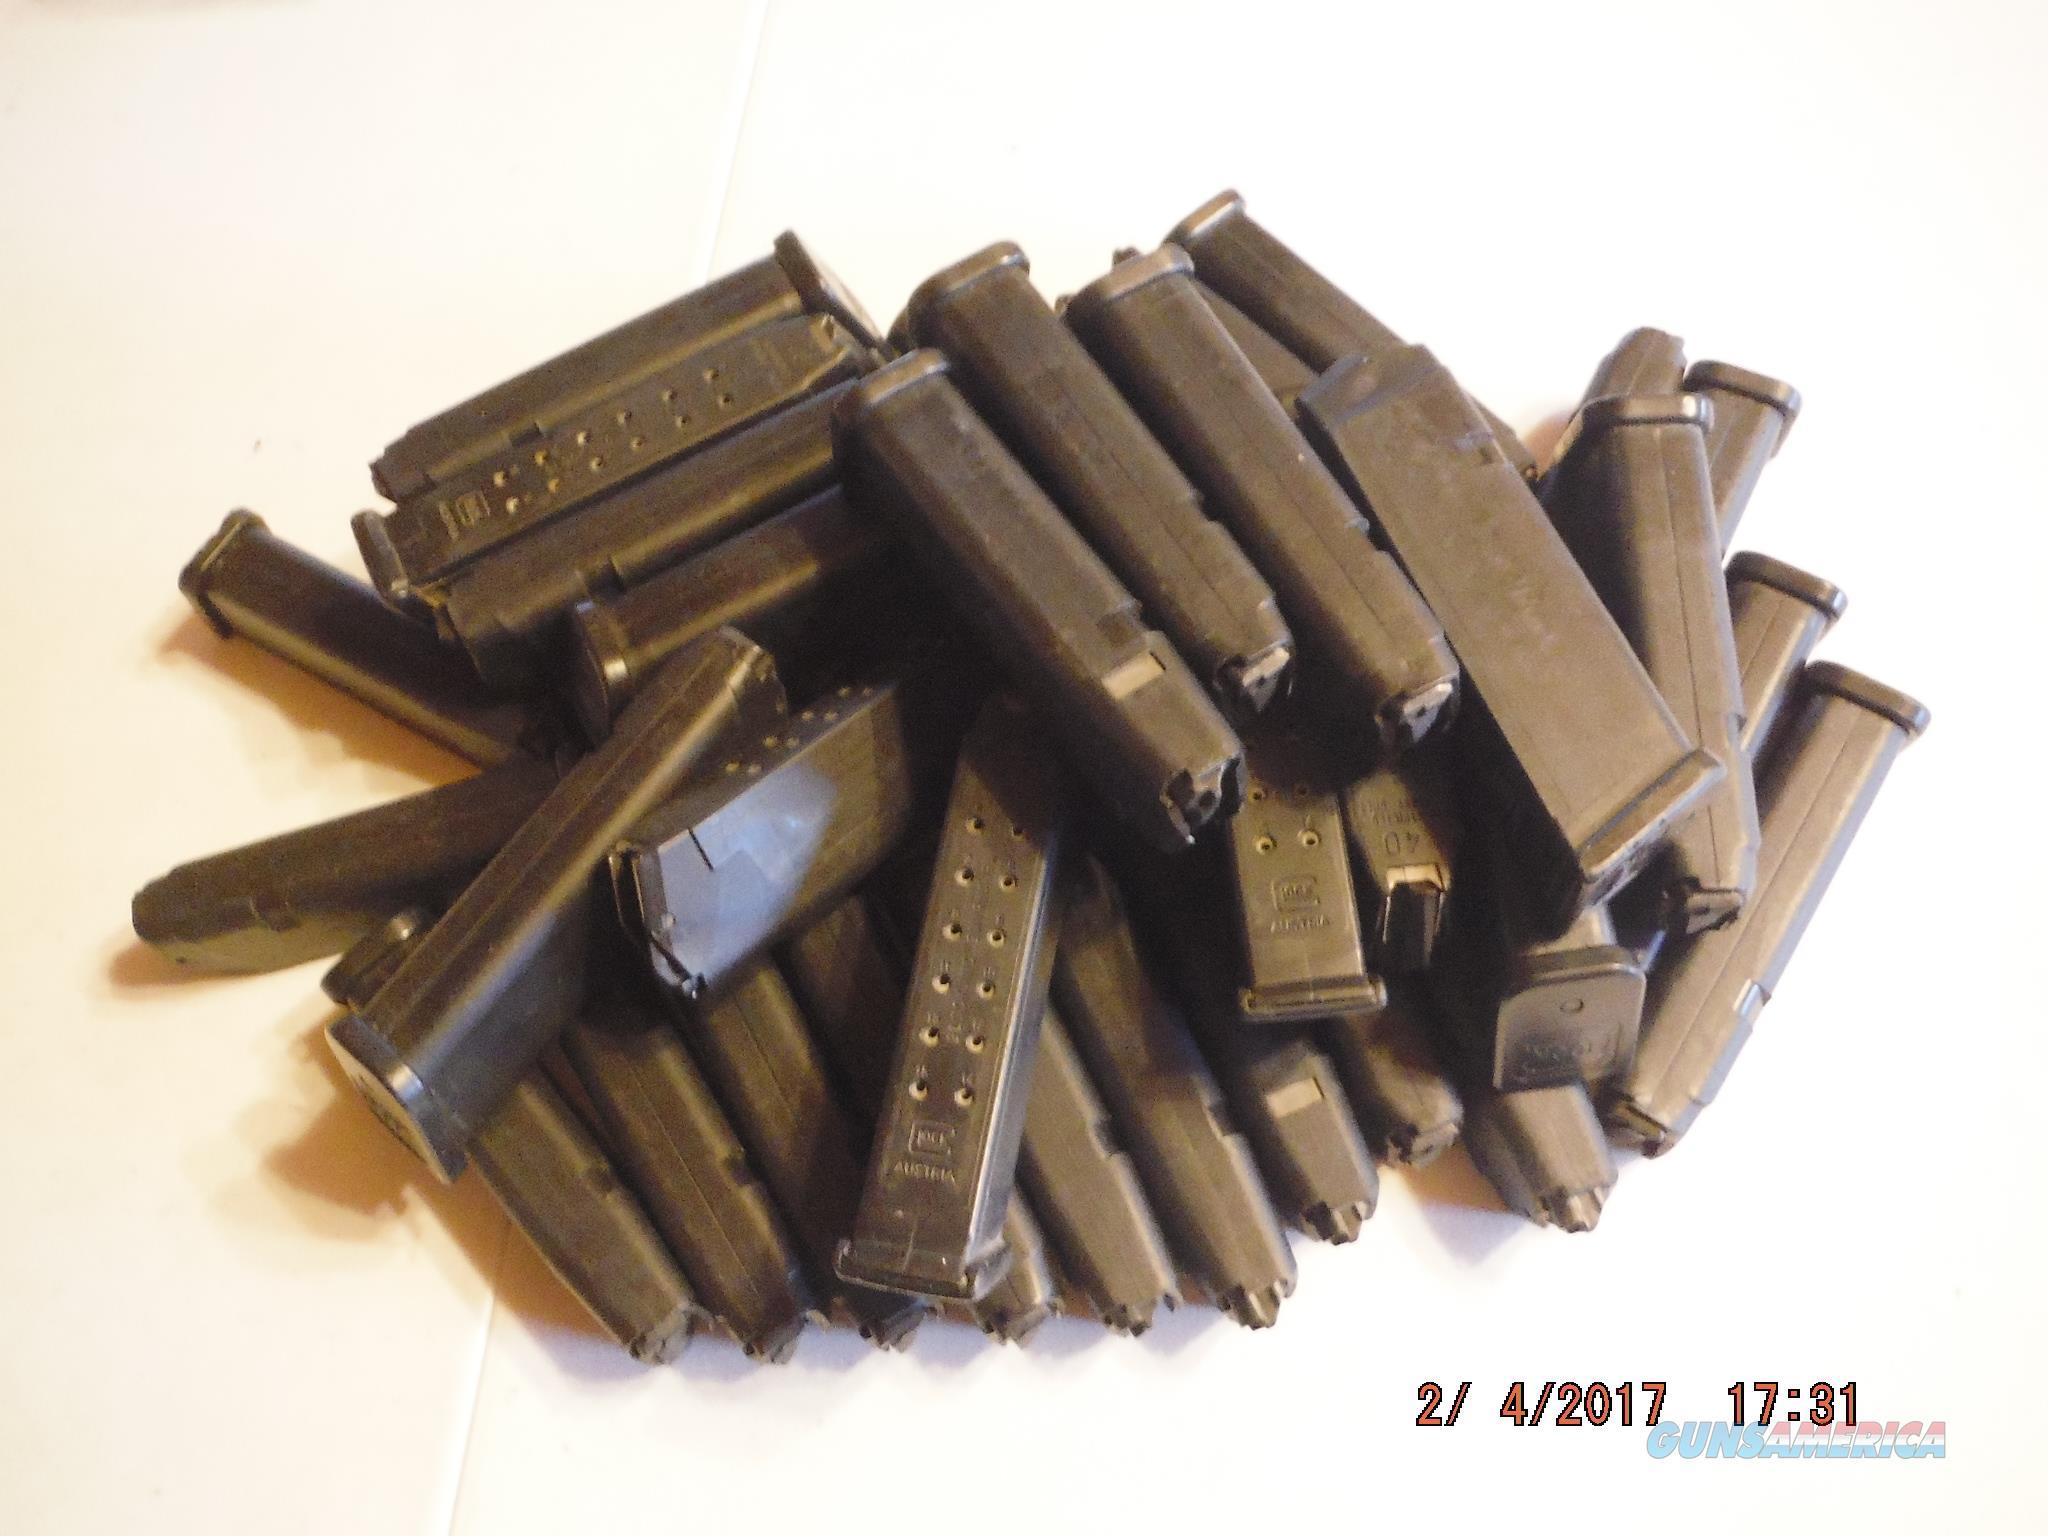 Glock 22/35 Magazine 40 S&W 15Rd GEN3 OEM LE marked -SALE-  Non-Guns > Magazines & Clips > Pistol Magazines > Glock